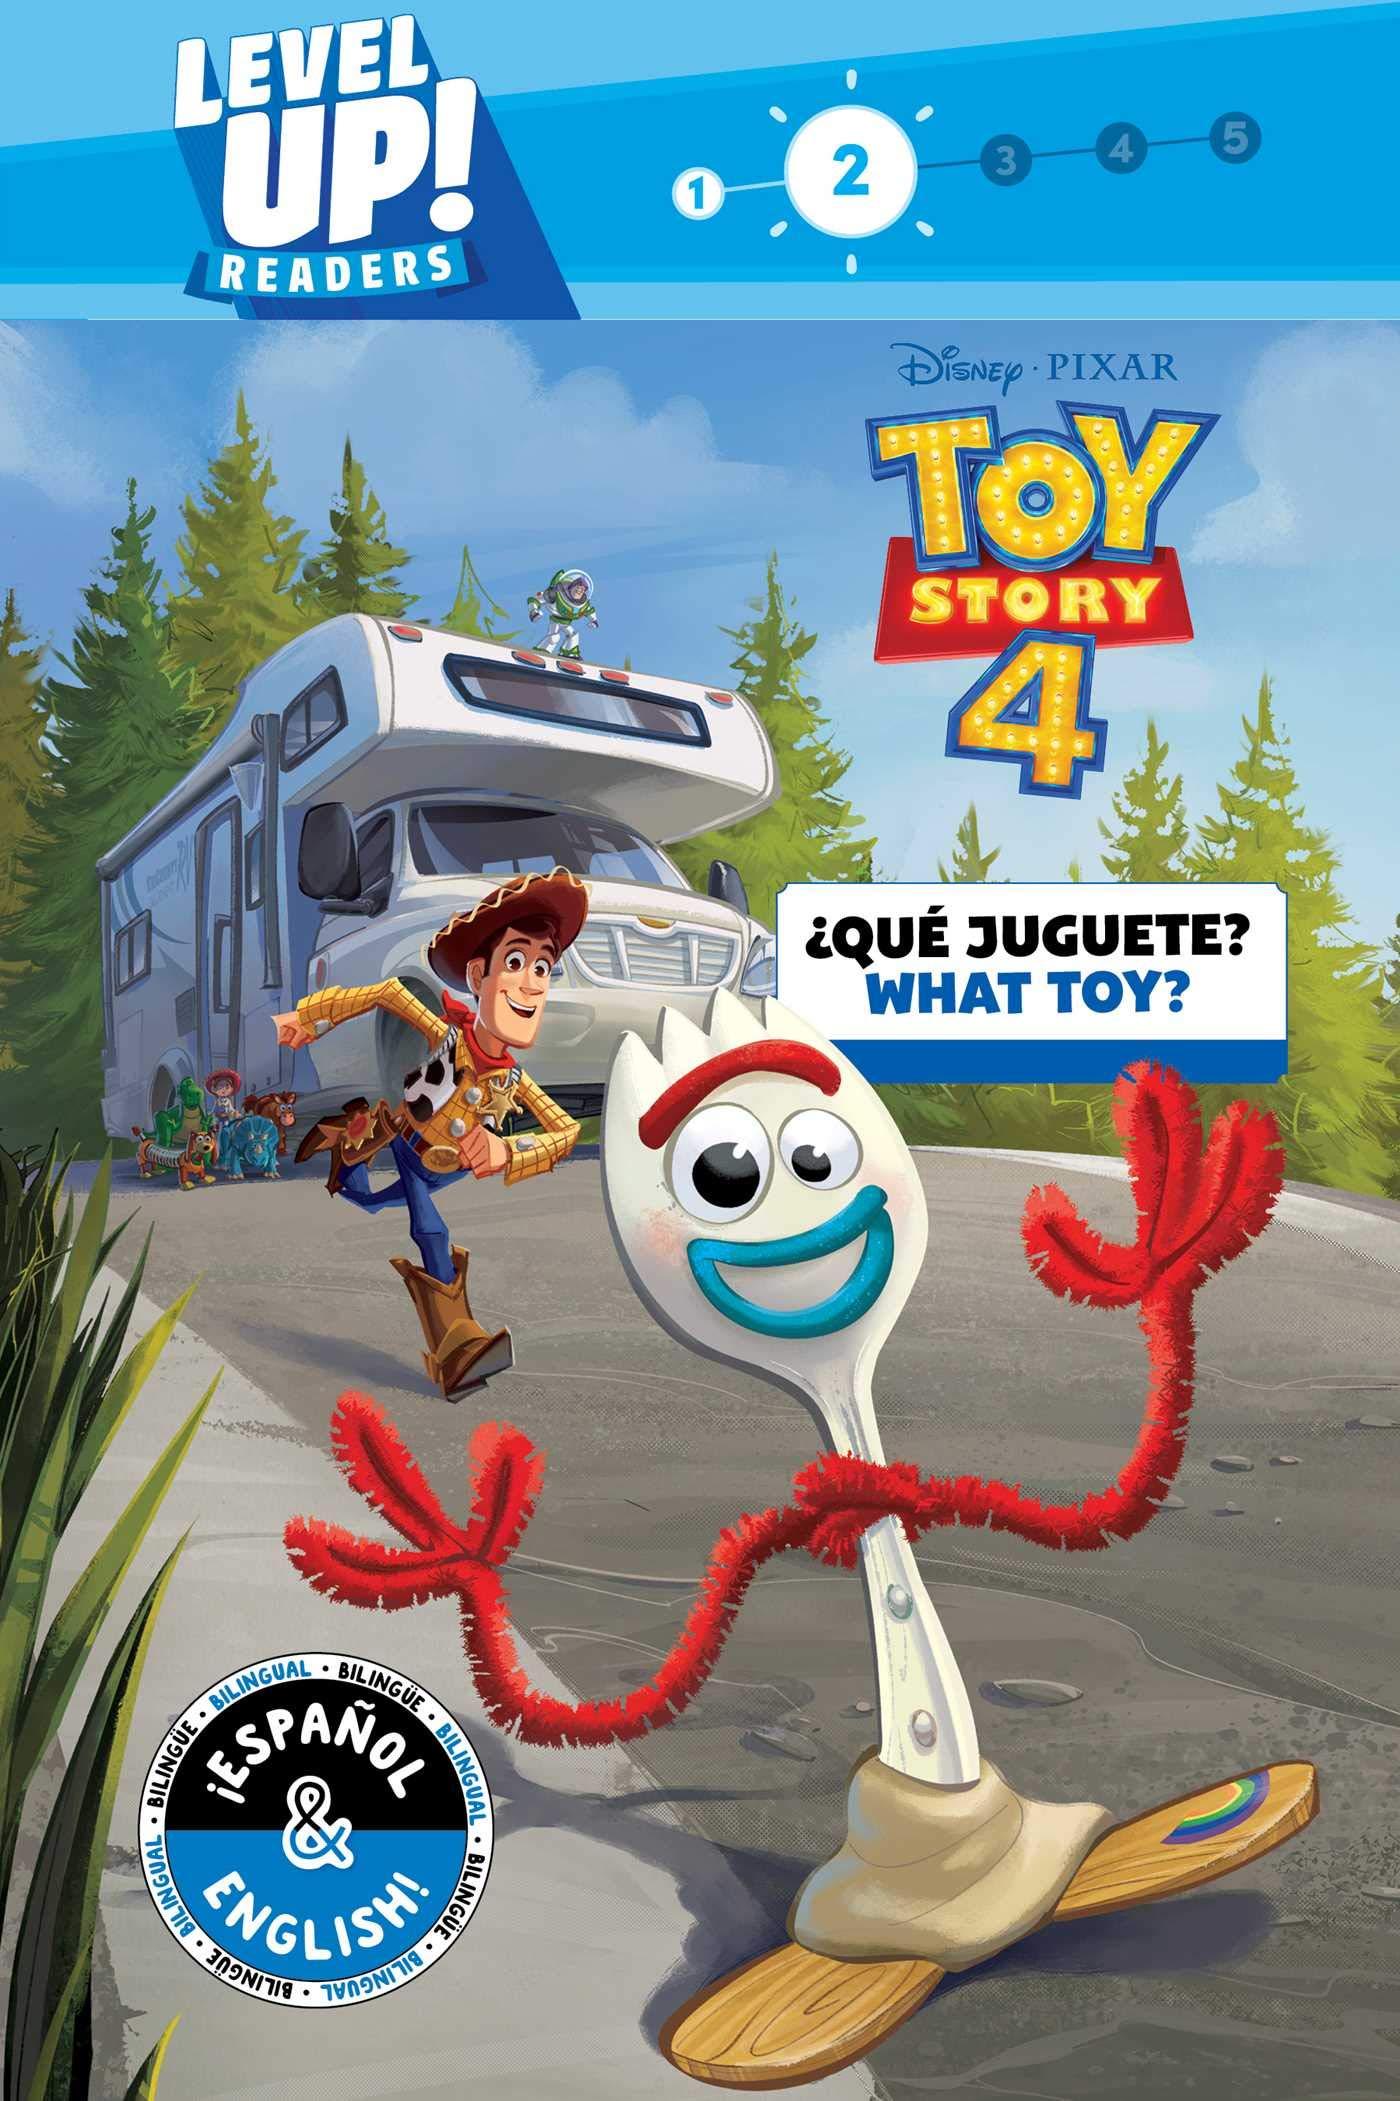 4746a33741122 ¿Qué juguete  (English-Spanish) (Disney Pixar Toy Story 4) (Level Up!  Readers) (Disney Bilingual) Paperback – August 6